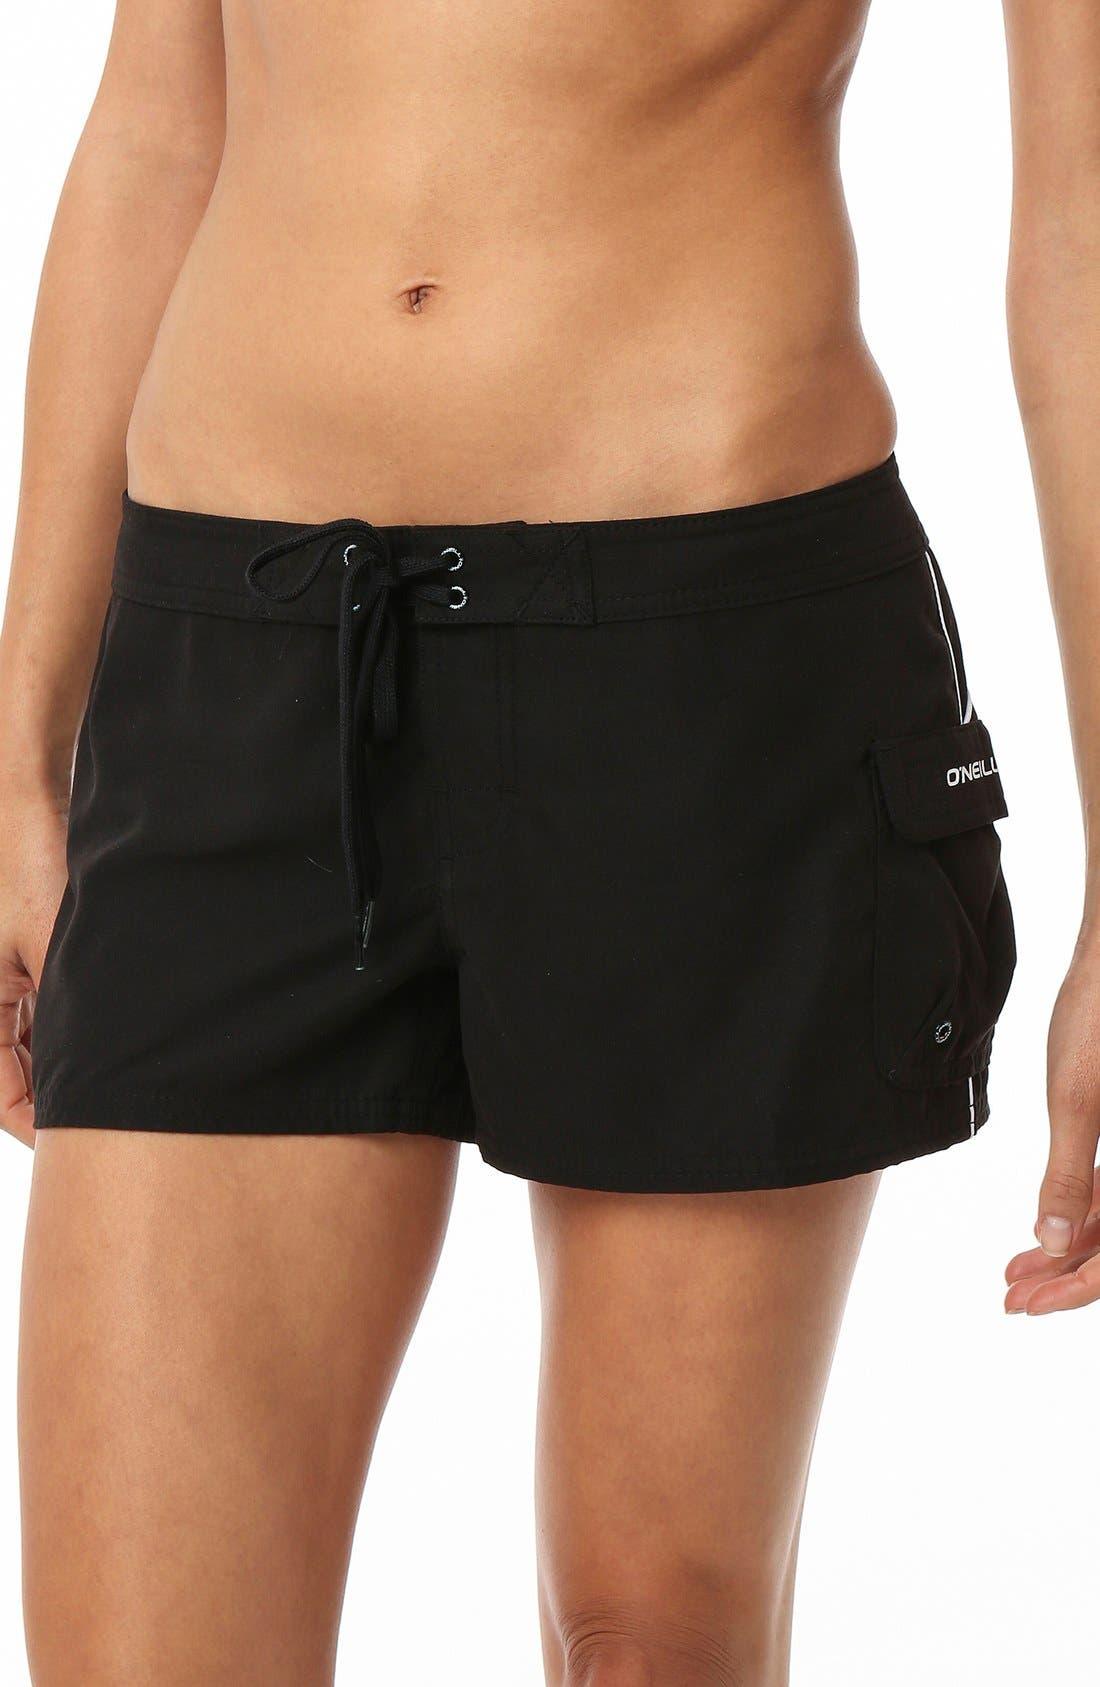 O'Neill 'Pacific' Board Shorts